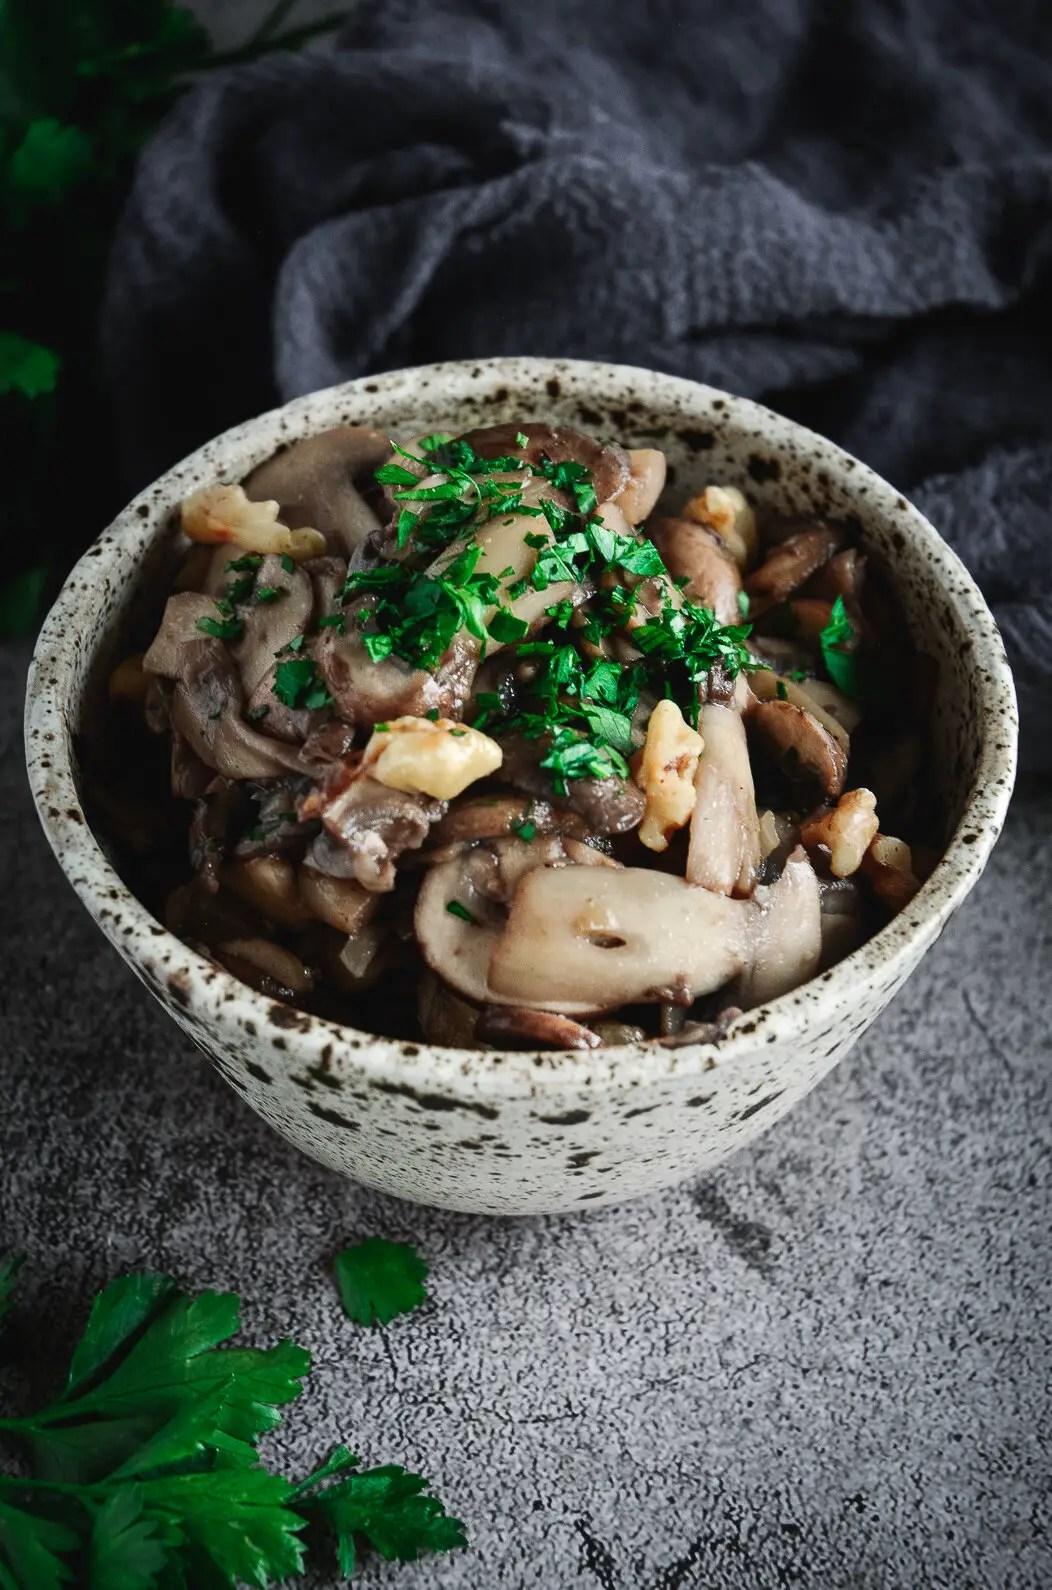 Sautéed mushrooms in bowl